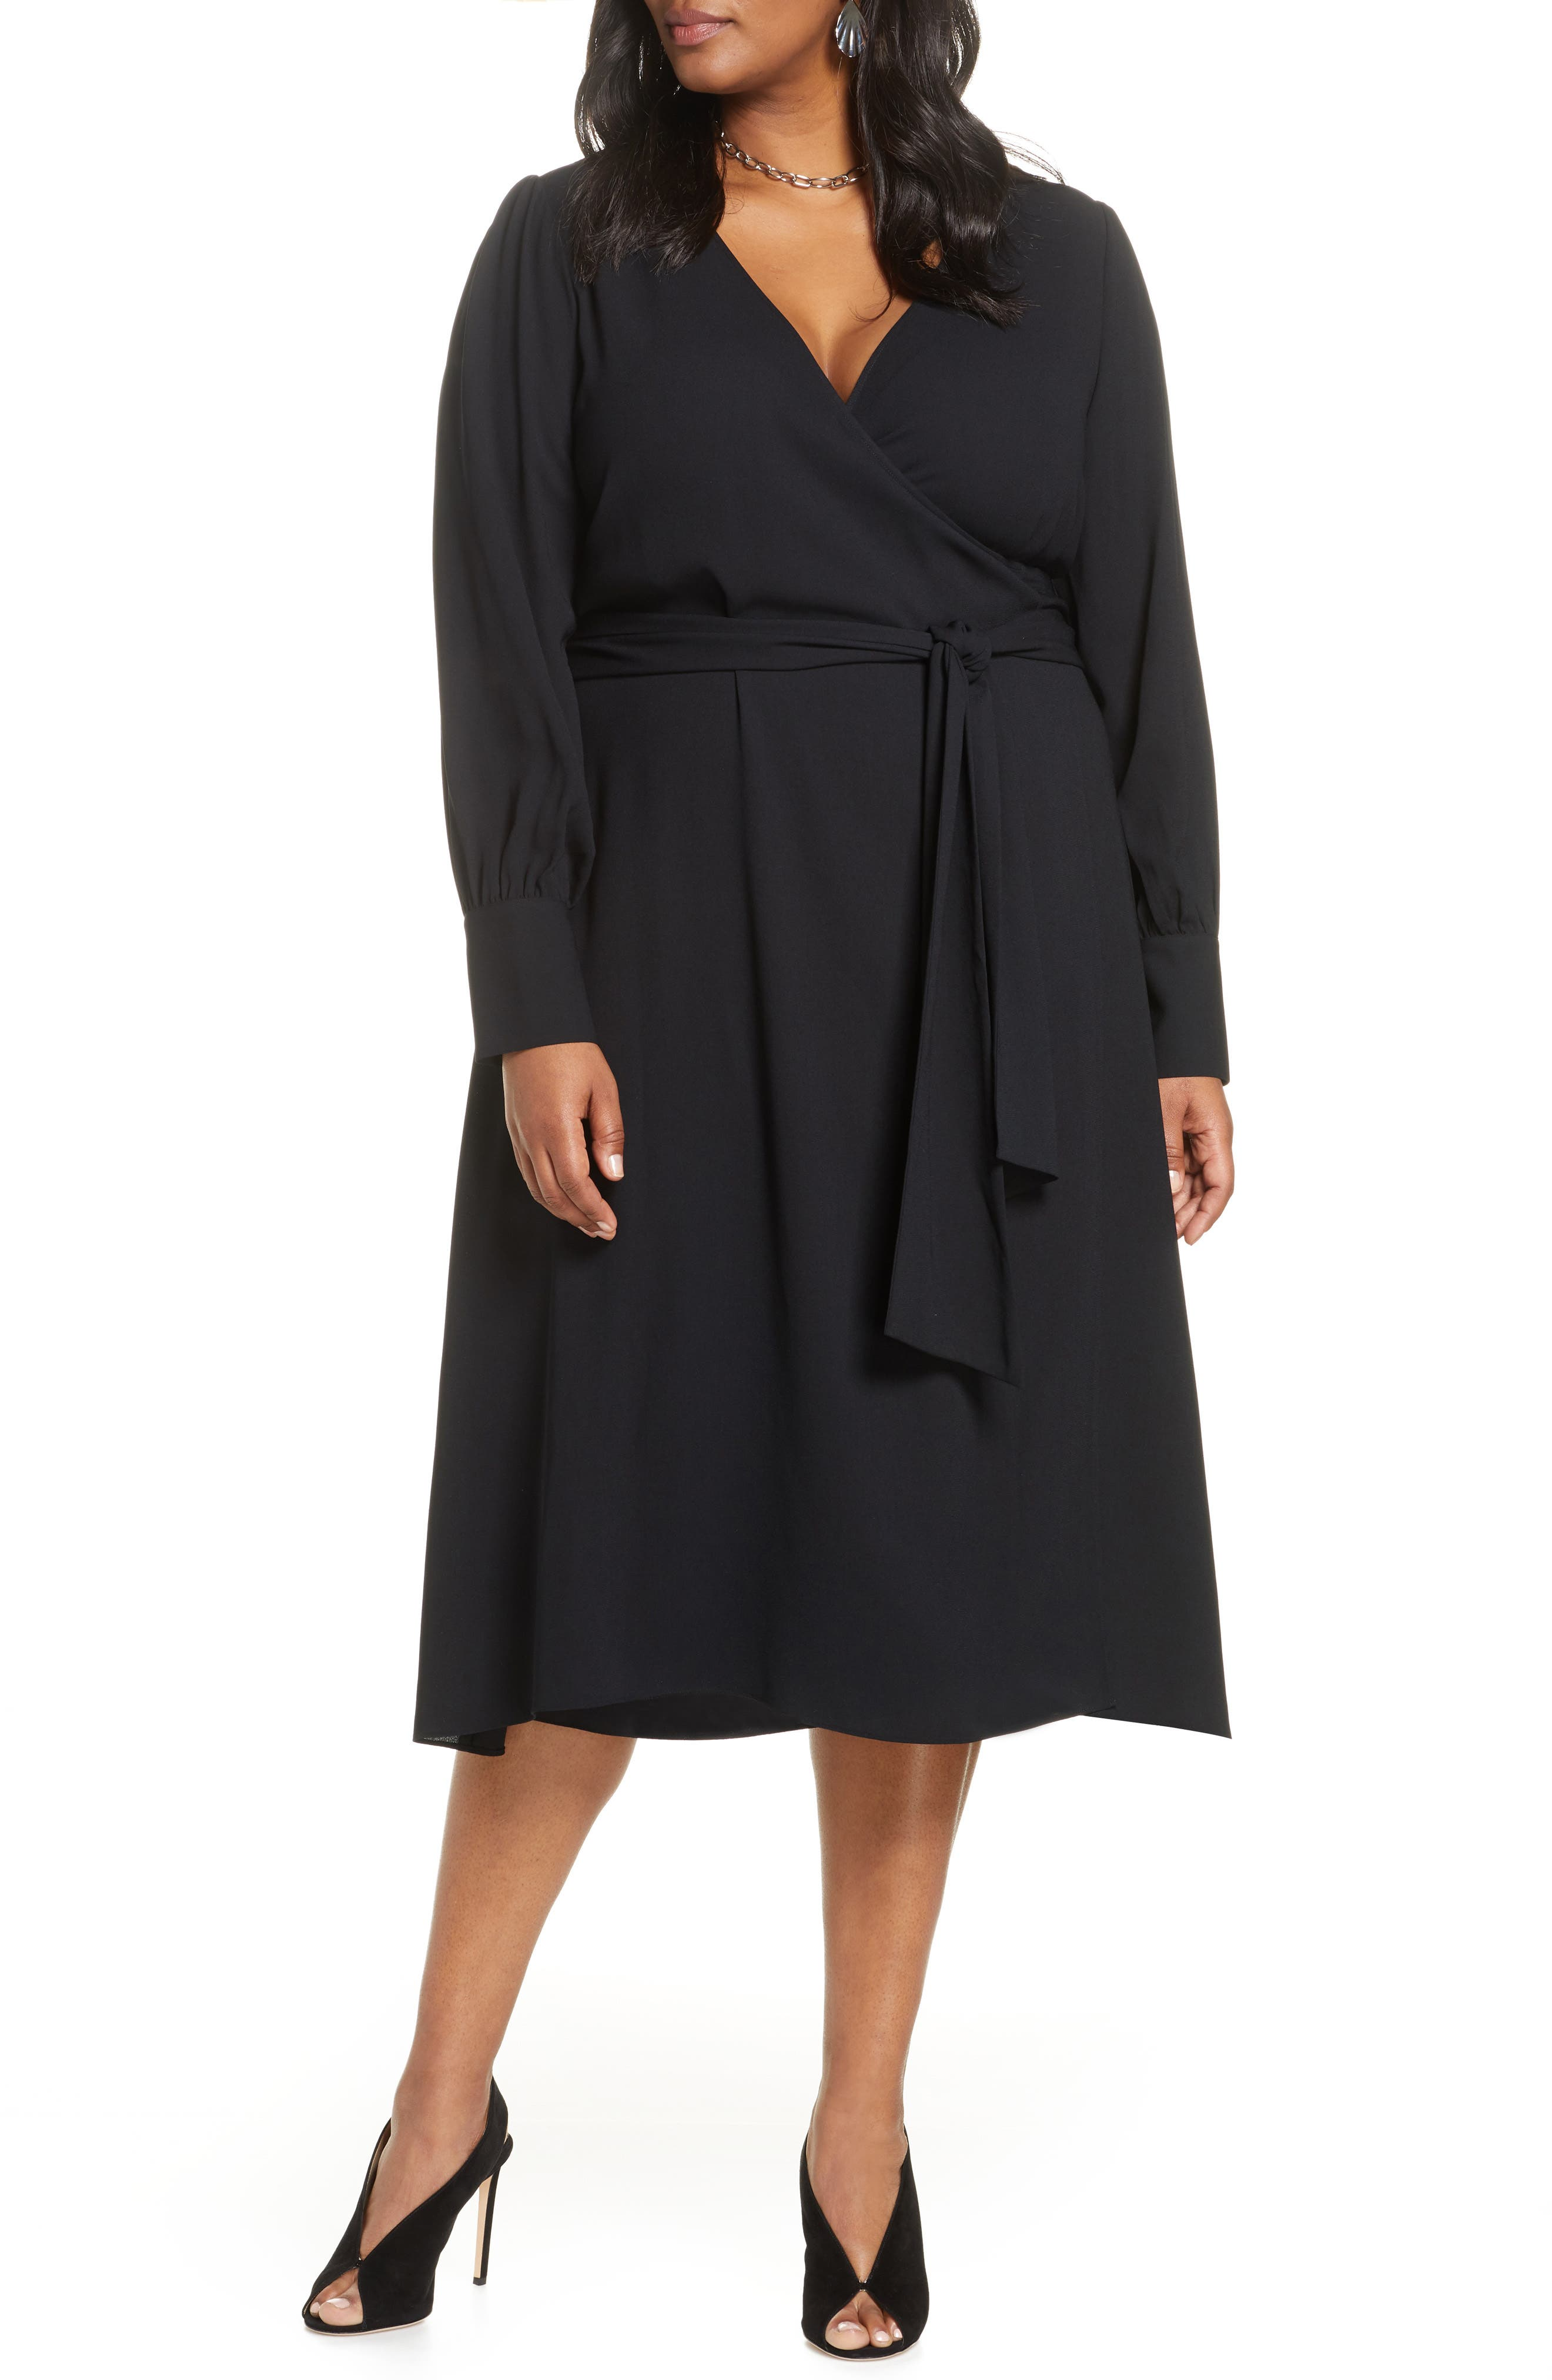 1940s Plus Size Dresses | Swing Dress, Tea Dress Plus Size Womens Halogen Long Sleeve Midi Wrap Dress Size 2X - Black $99.00 AT vintagedancer.com